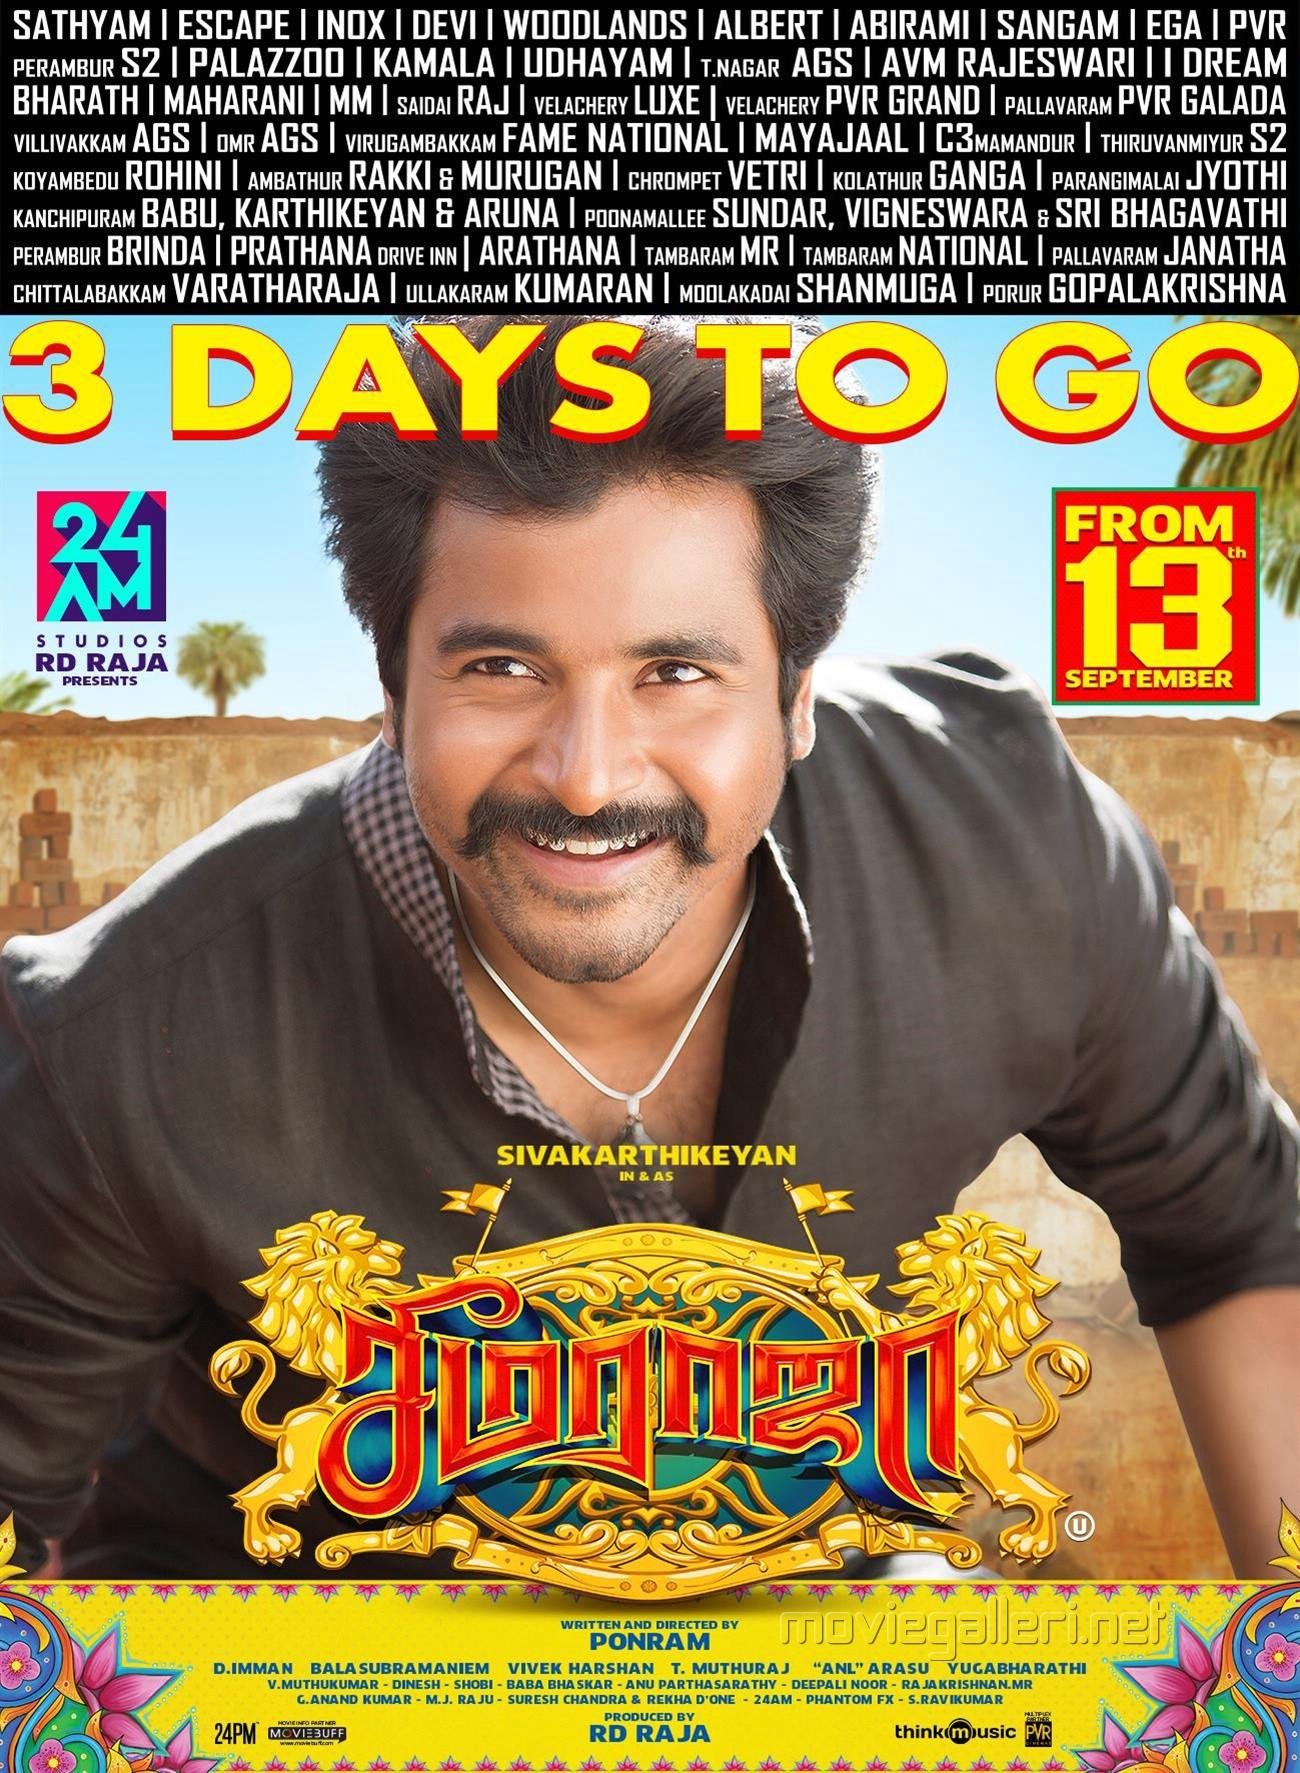 Sivakarthikeyan Seema Raja 3 Days to Go Poster